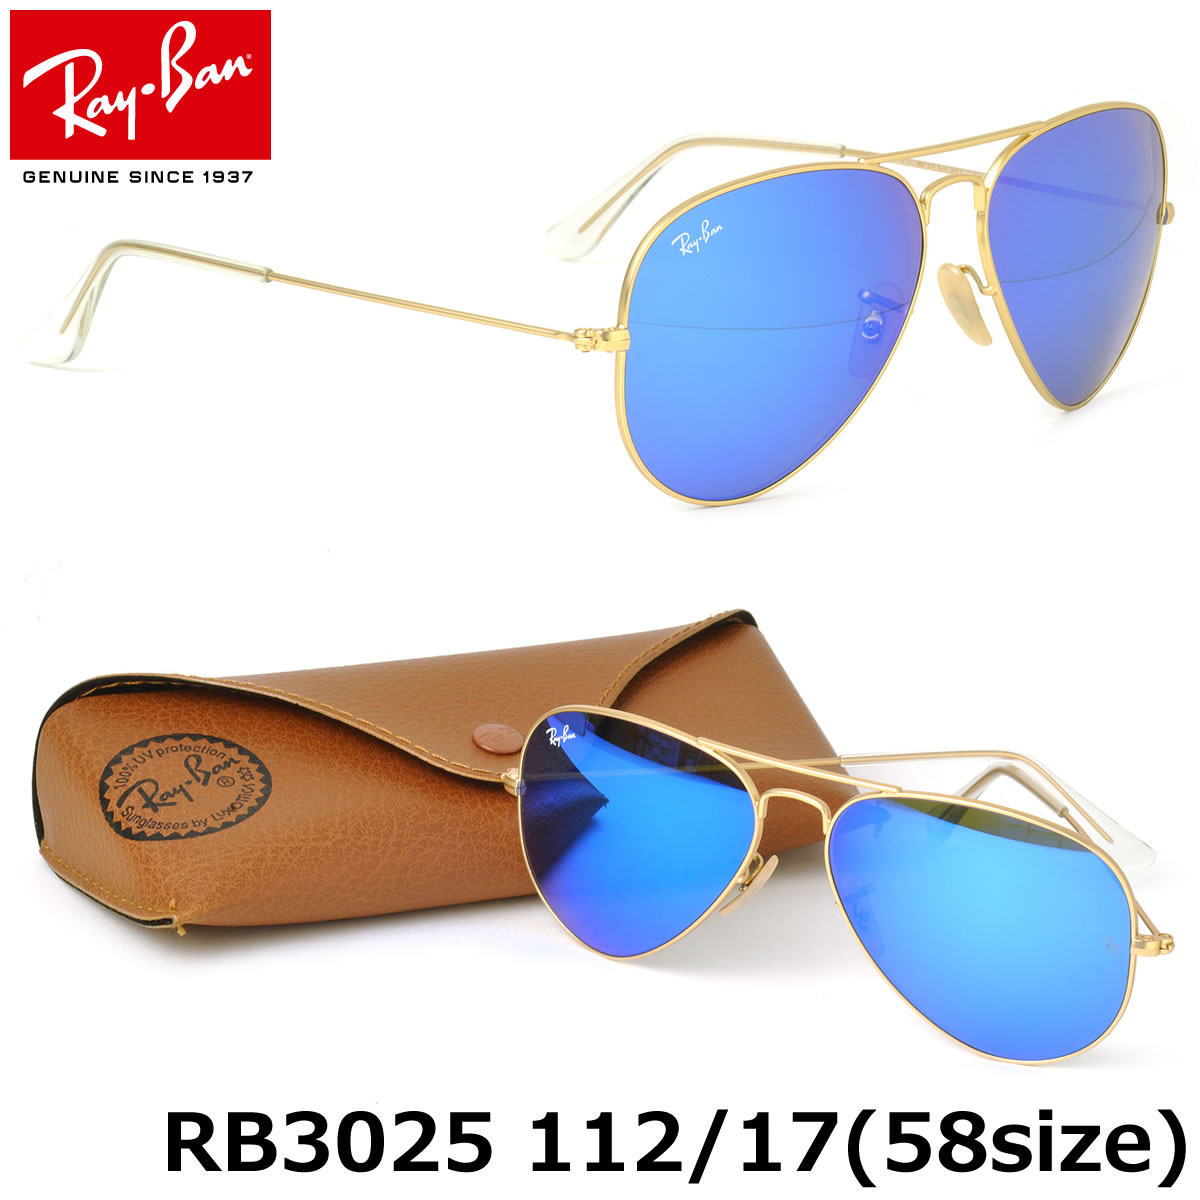 【Ray-Ban】(レイバン) アビエーター クラシックメタル サングラス RB3025 …...:thats:10022506